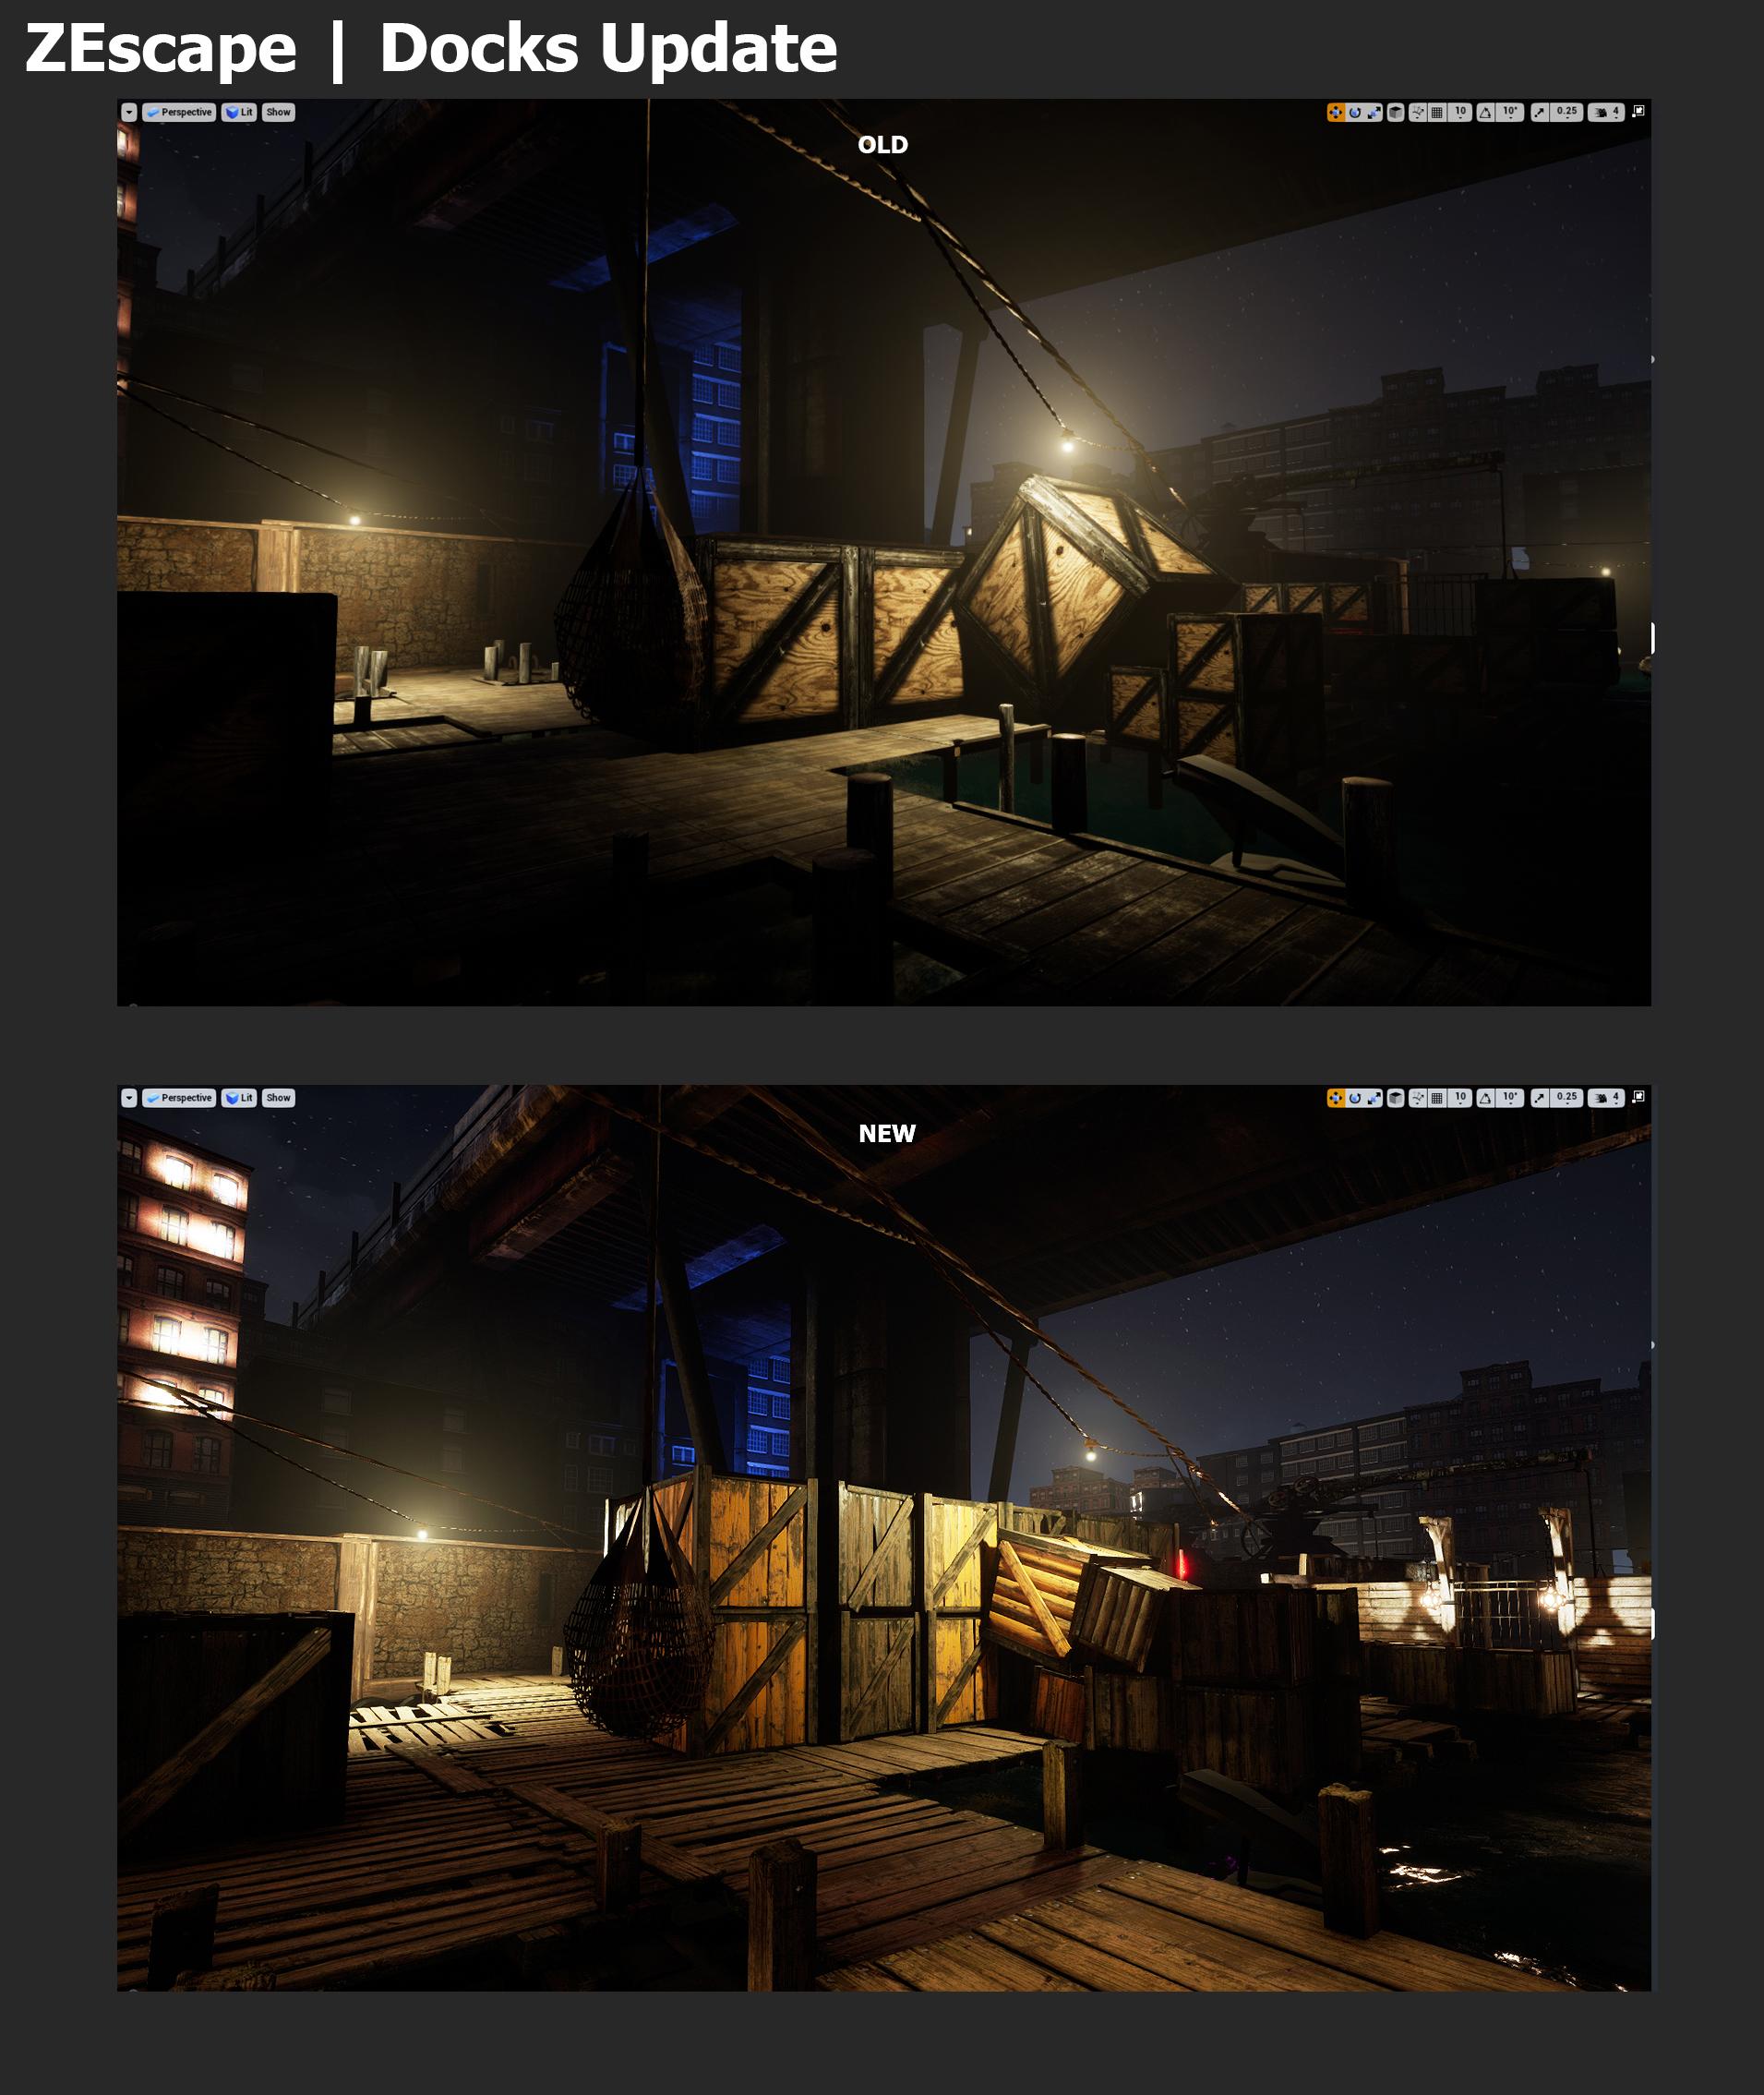 docks update1